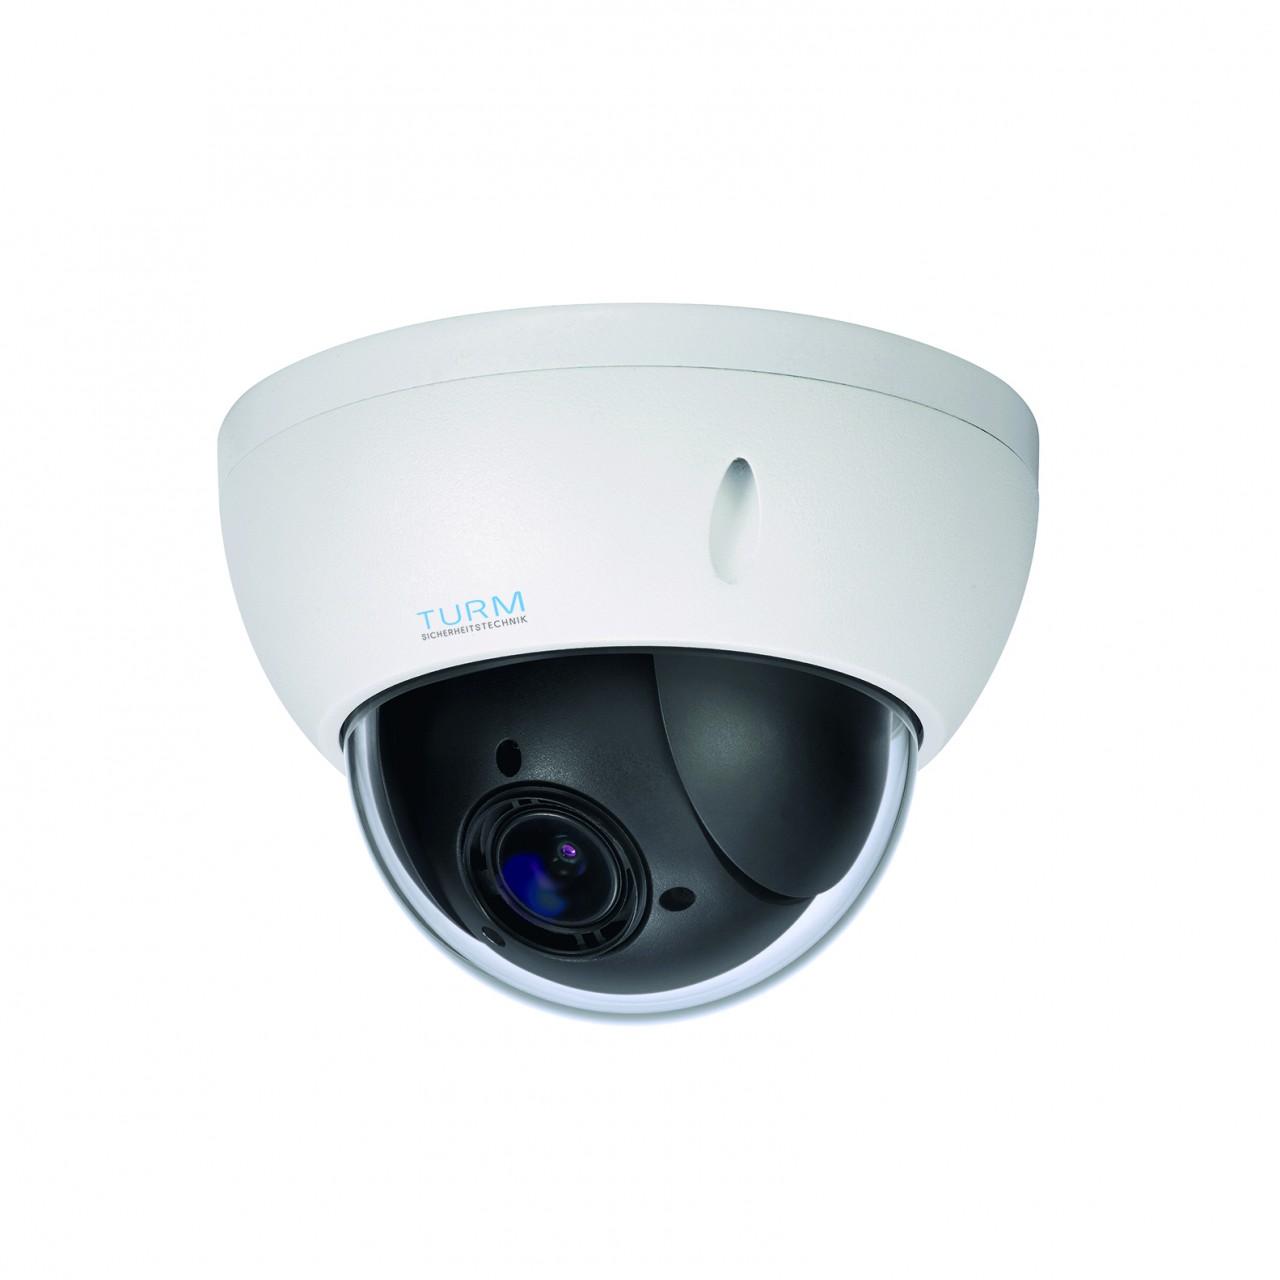 TURM HDCVI Professional 2 MP PTZ Dome Kamera mit 4x Zoom und 100°/s schwenkbar